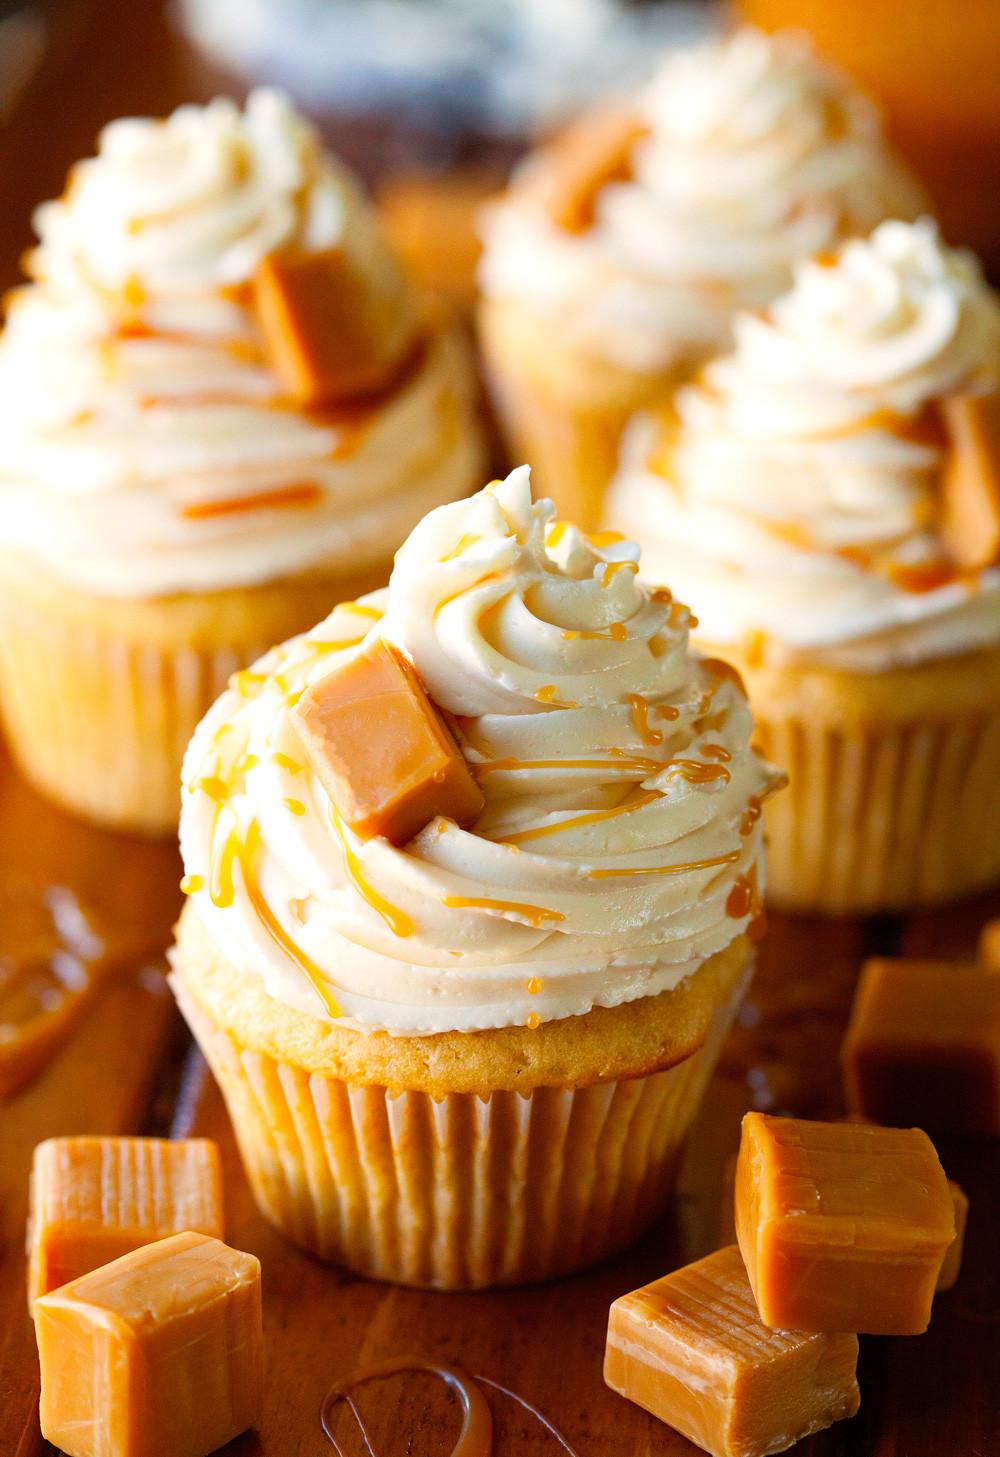 Salted Caramel Cupcakes  The Best Salted Caramel Cupcakes